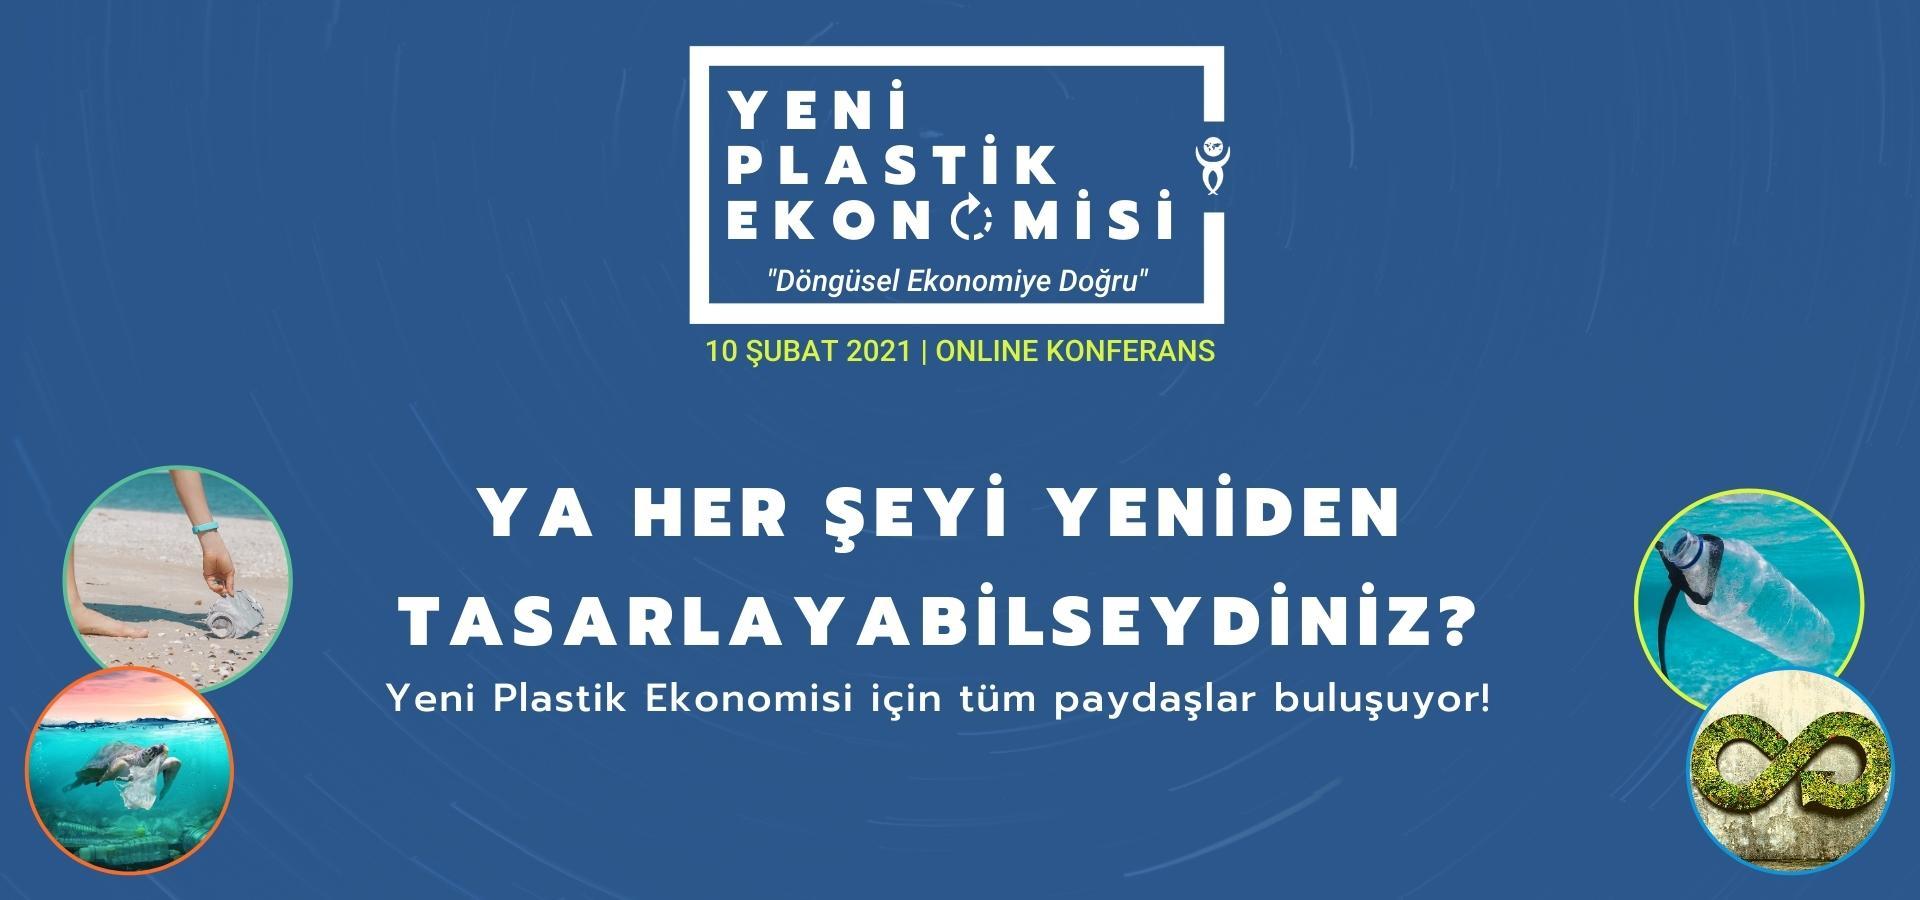 Yeni Plastik Ekonomisi Online Konferans